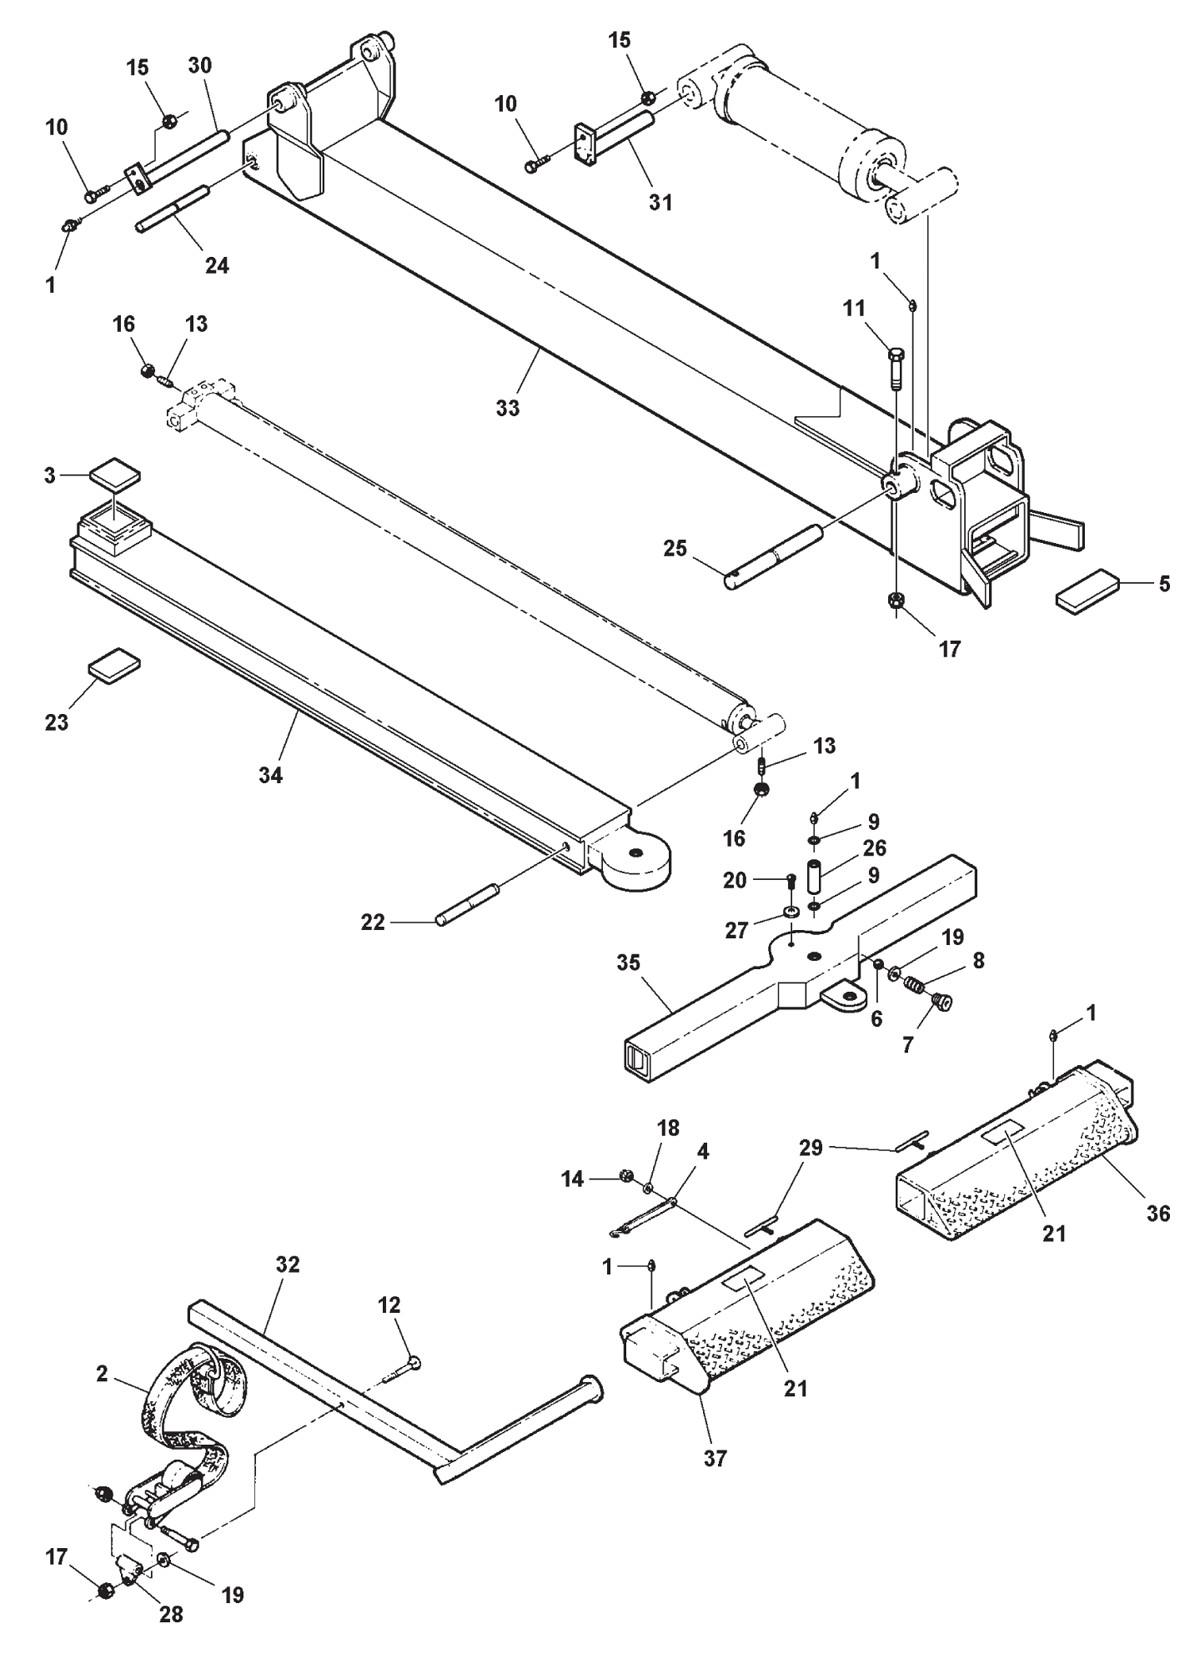 Car Wheel assembly Diagram Wheel Lift Slide In Tire Restraint assembly Of Car Wheel assembly Diagram